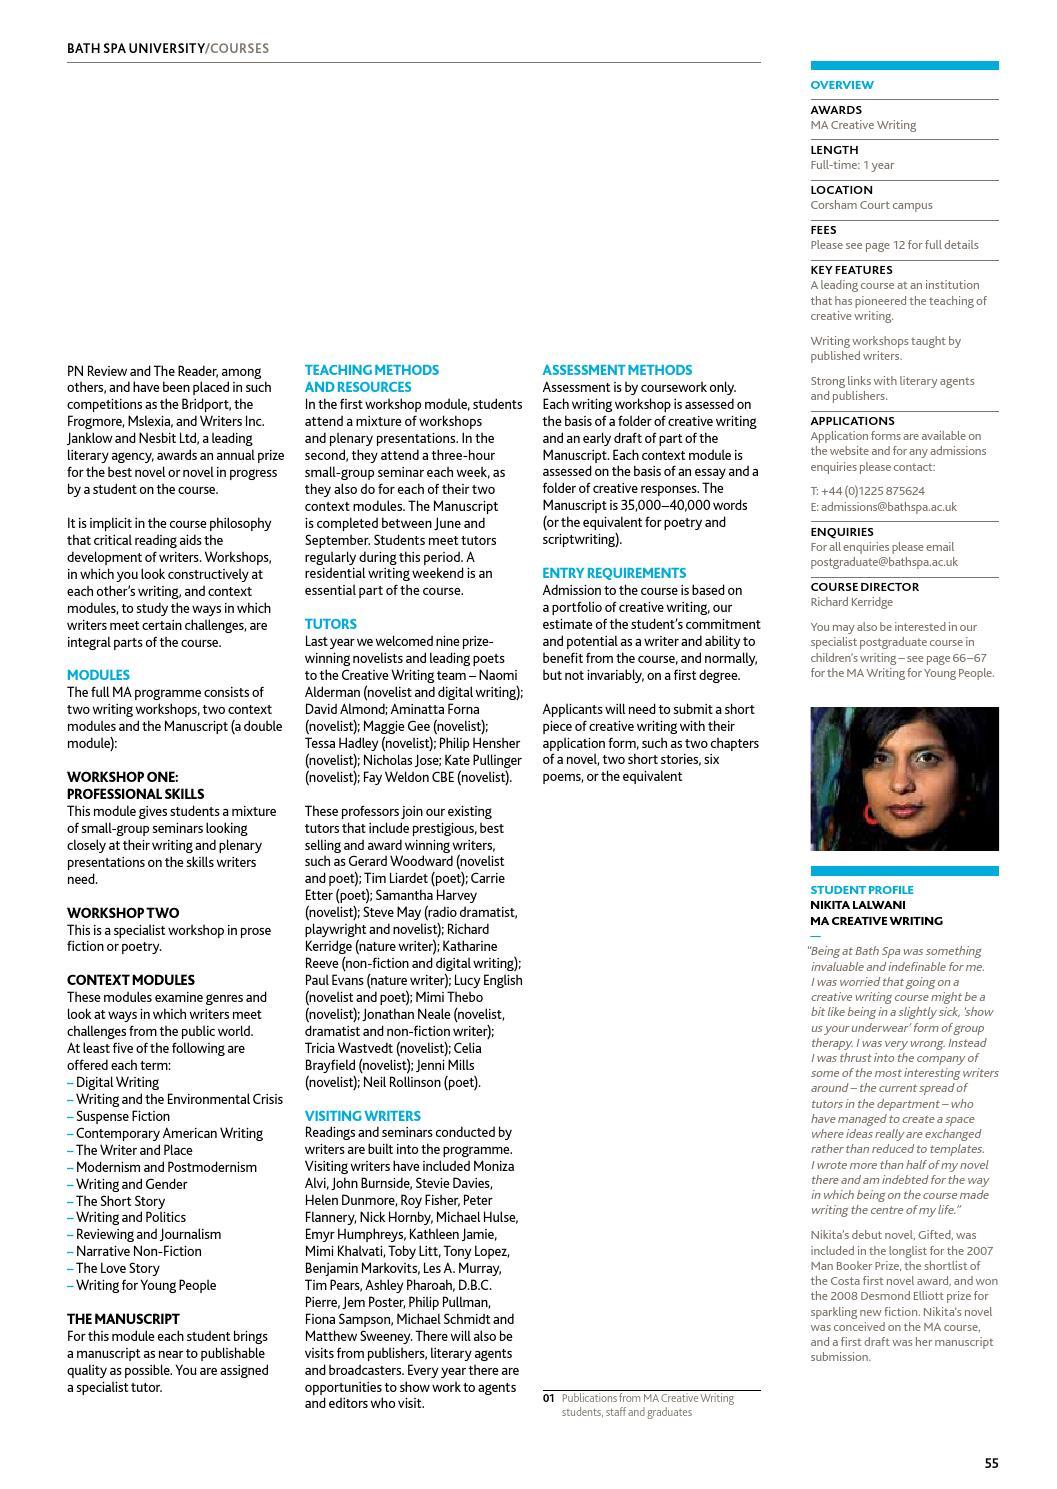 Postgraduate Prospectus 2014 by Bath Spa University - issuu